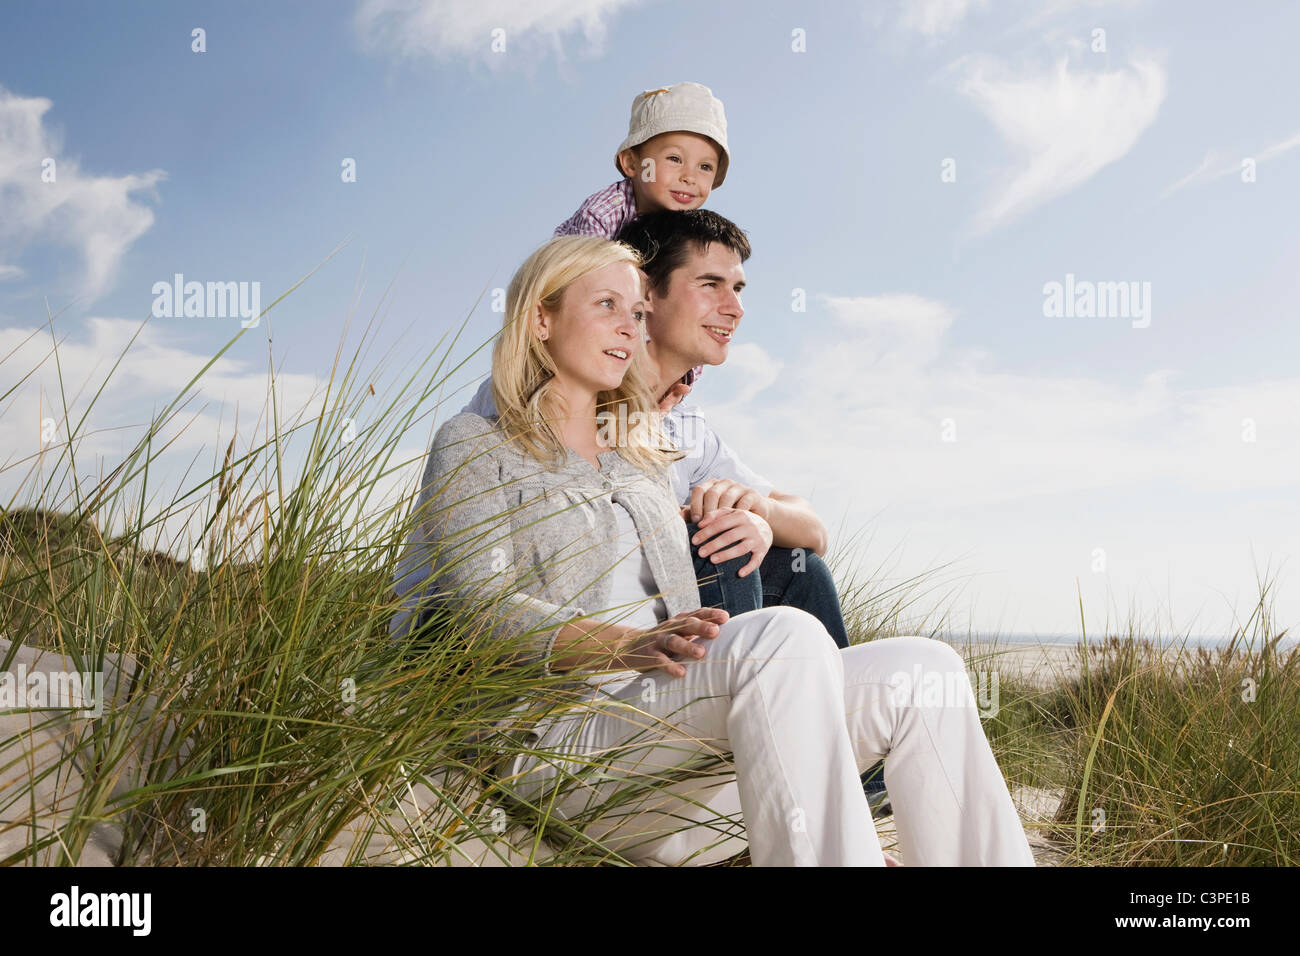 Germany, Schleswig Holstein, Amrum, familiy in the dunes - Stock Image